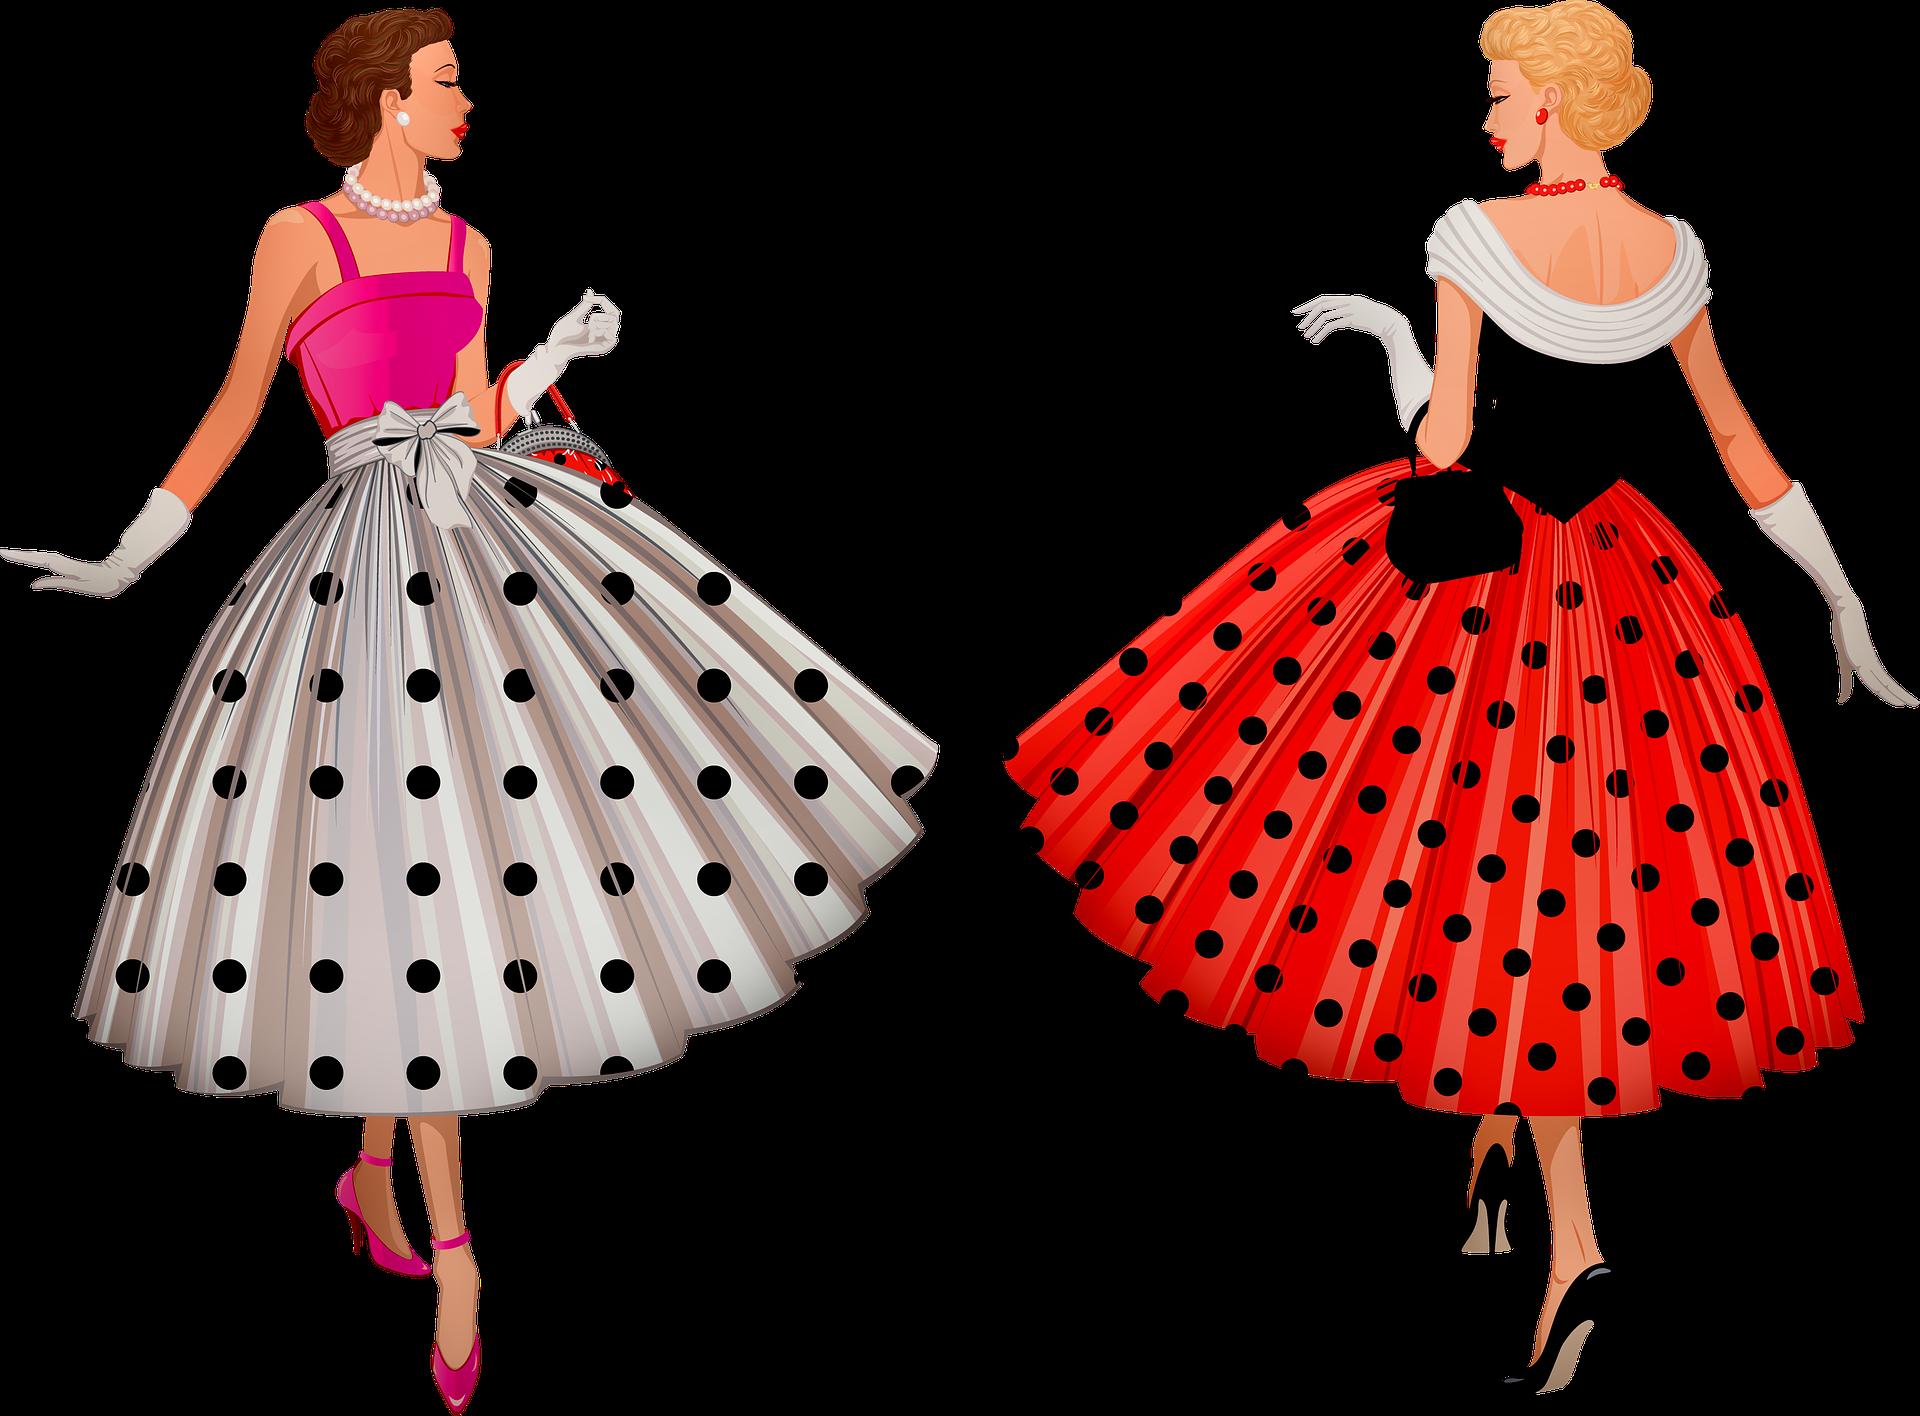 vintage-women-3662306_1920